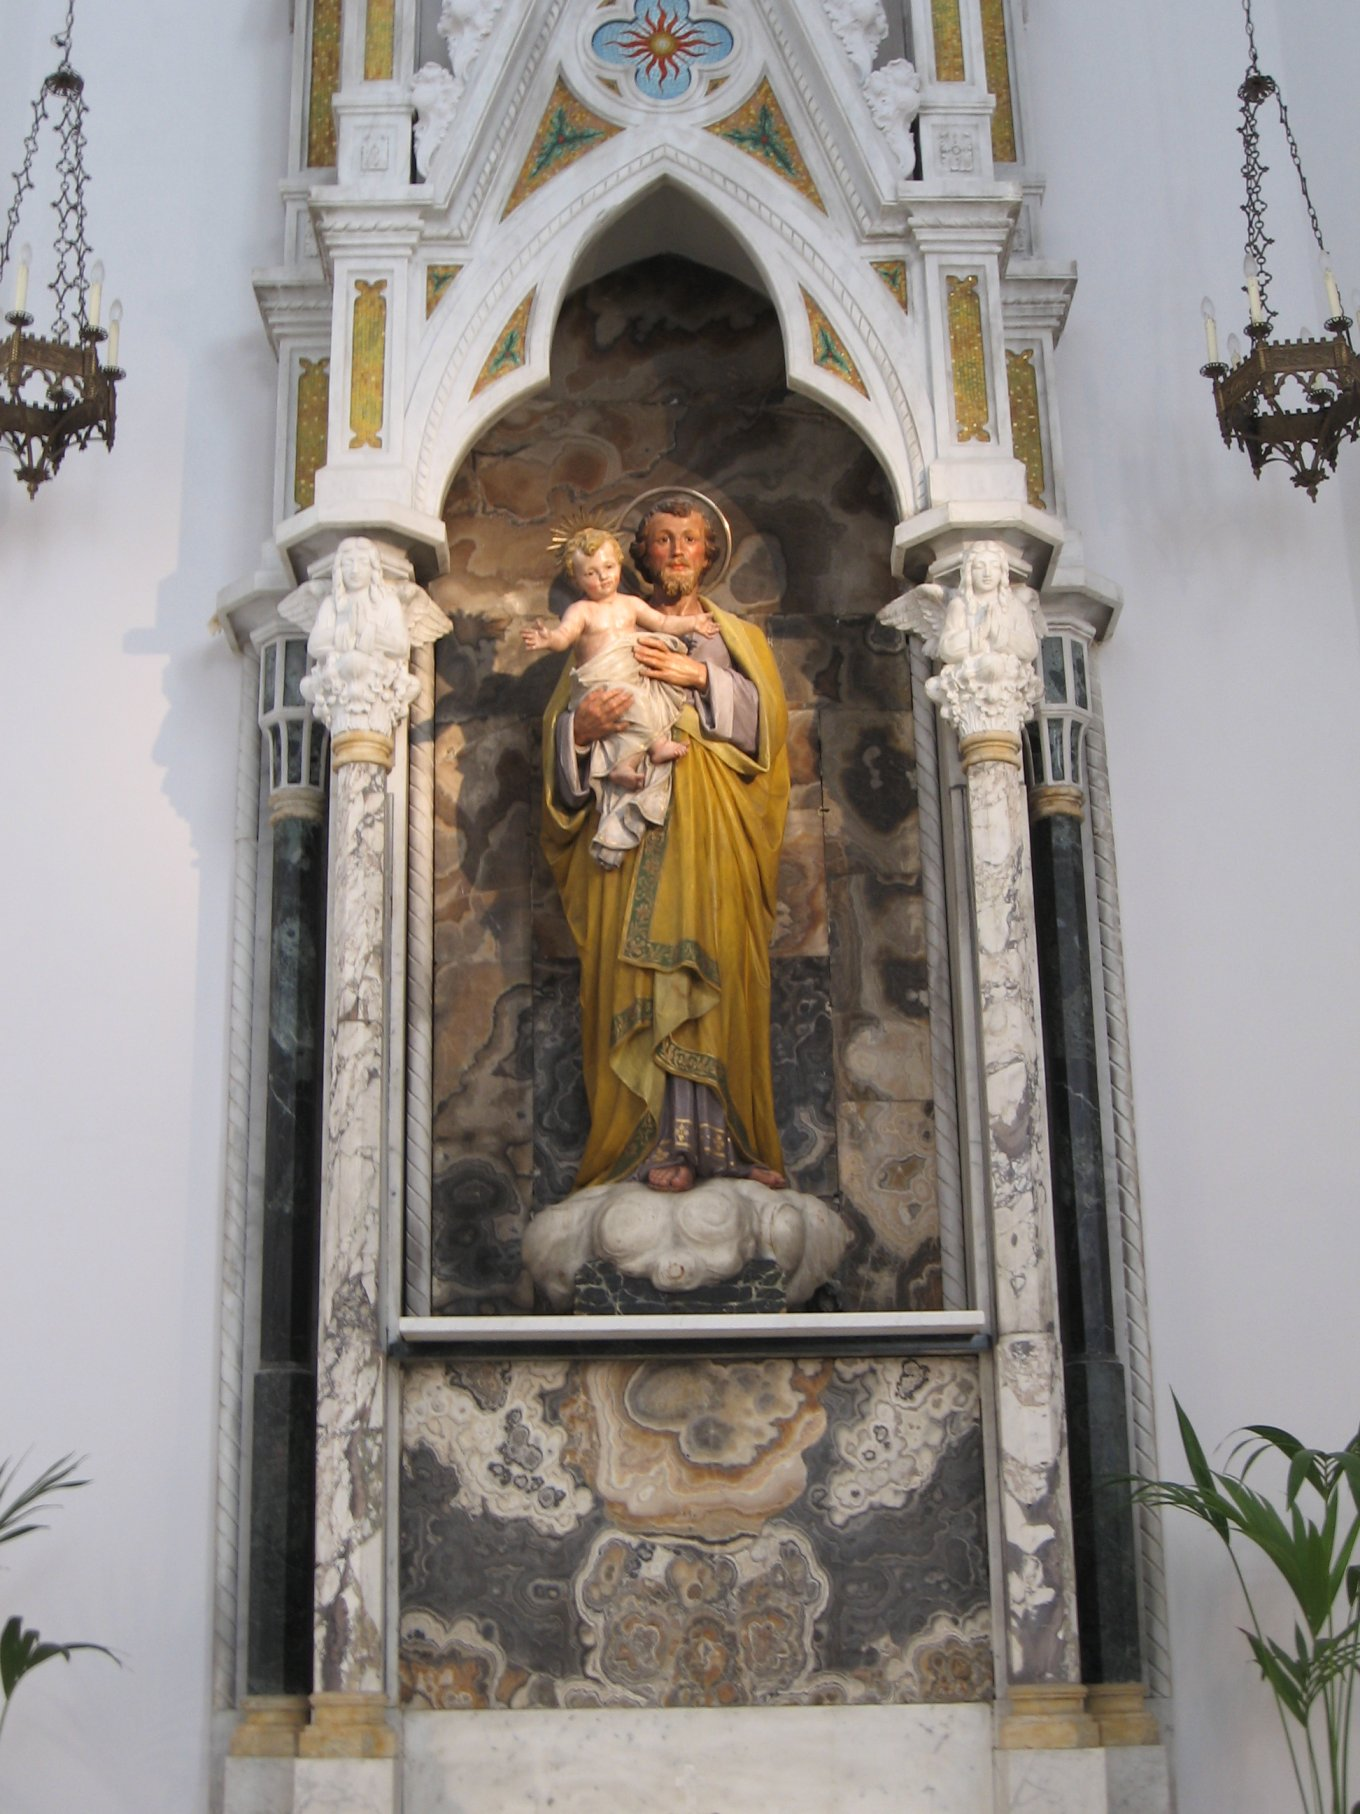 Chiesa_interno-2009-01-27-13.03.29.jpg